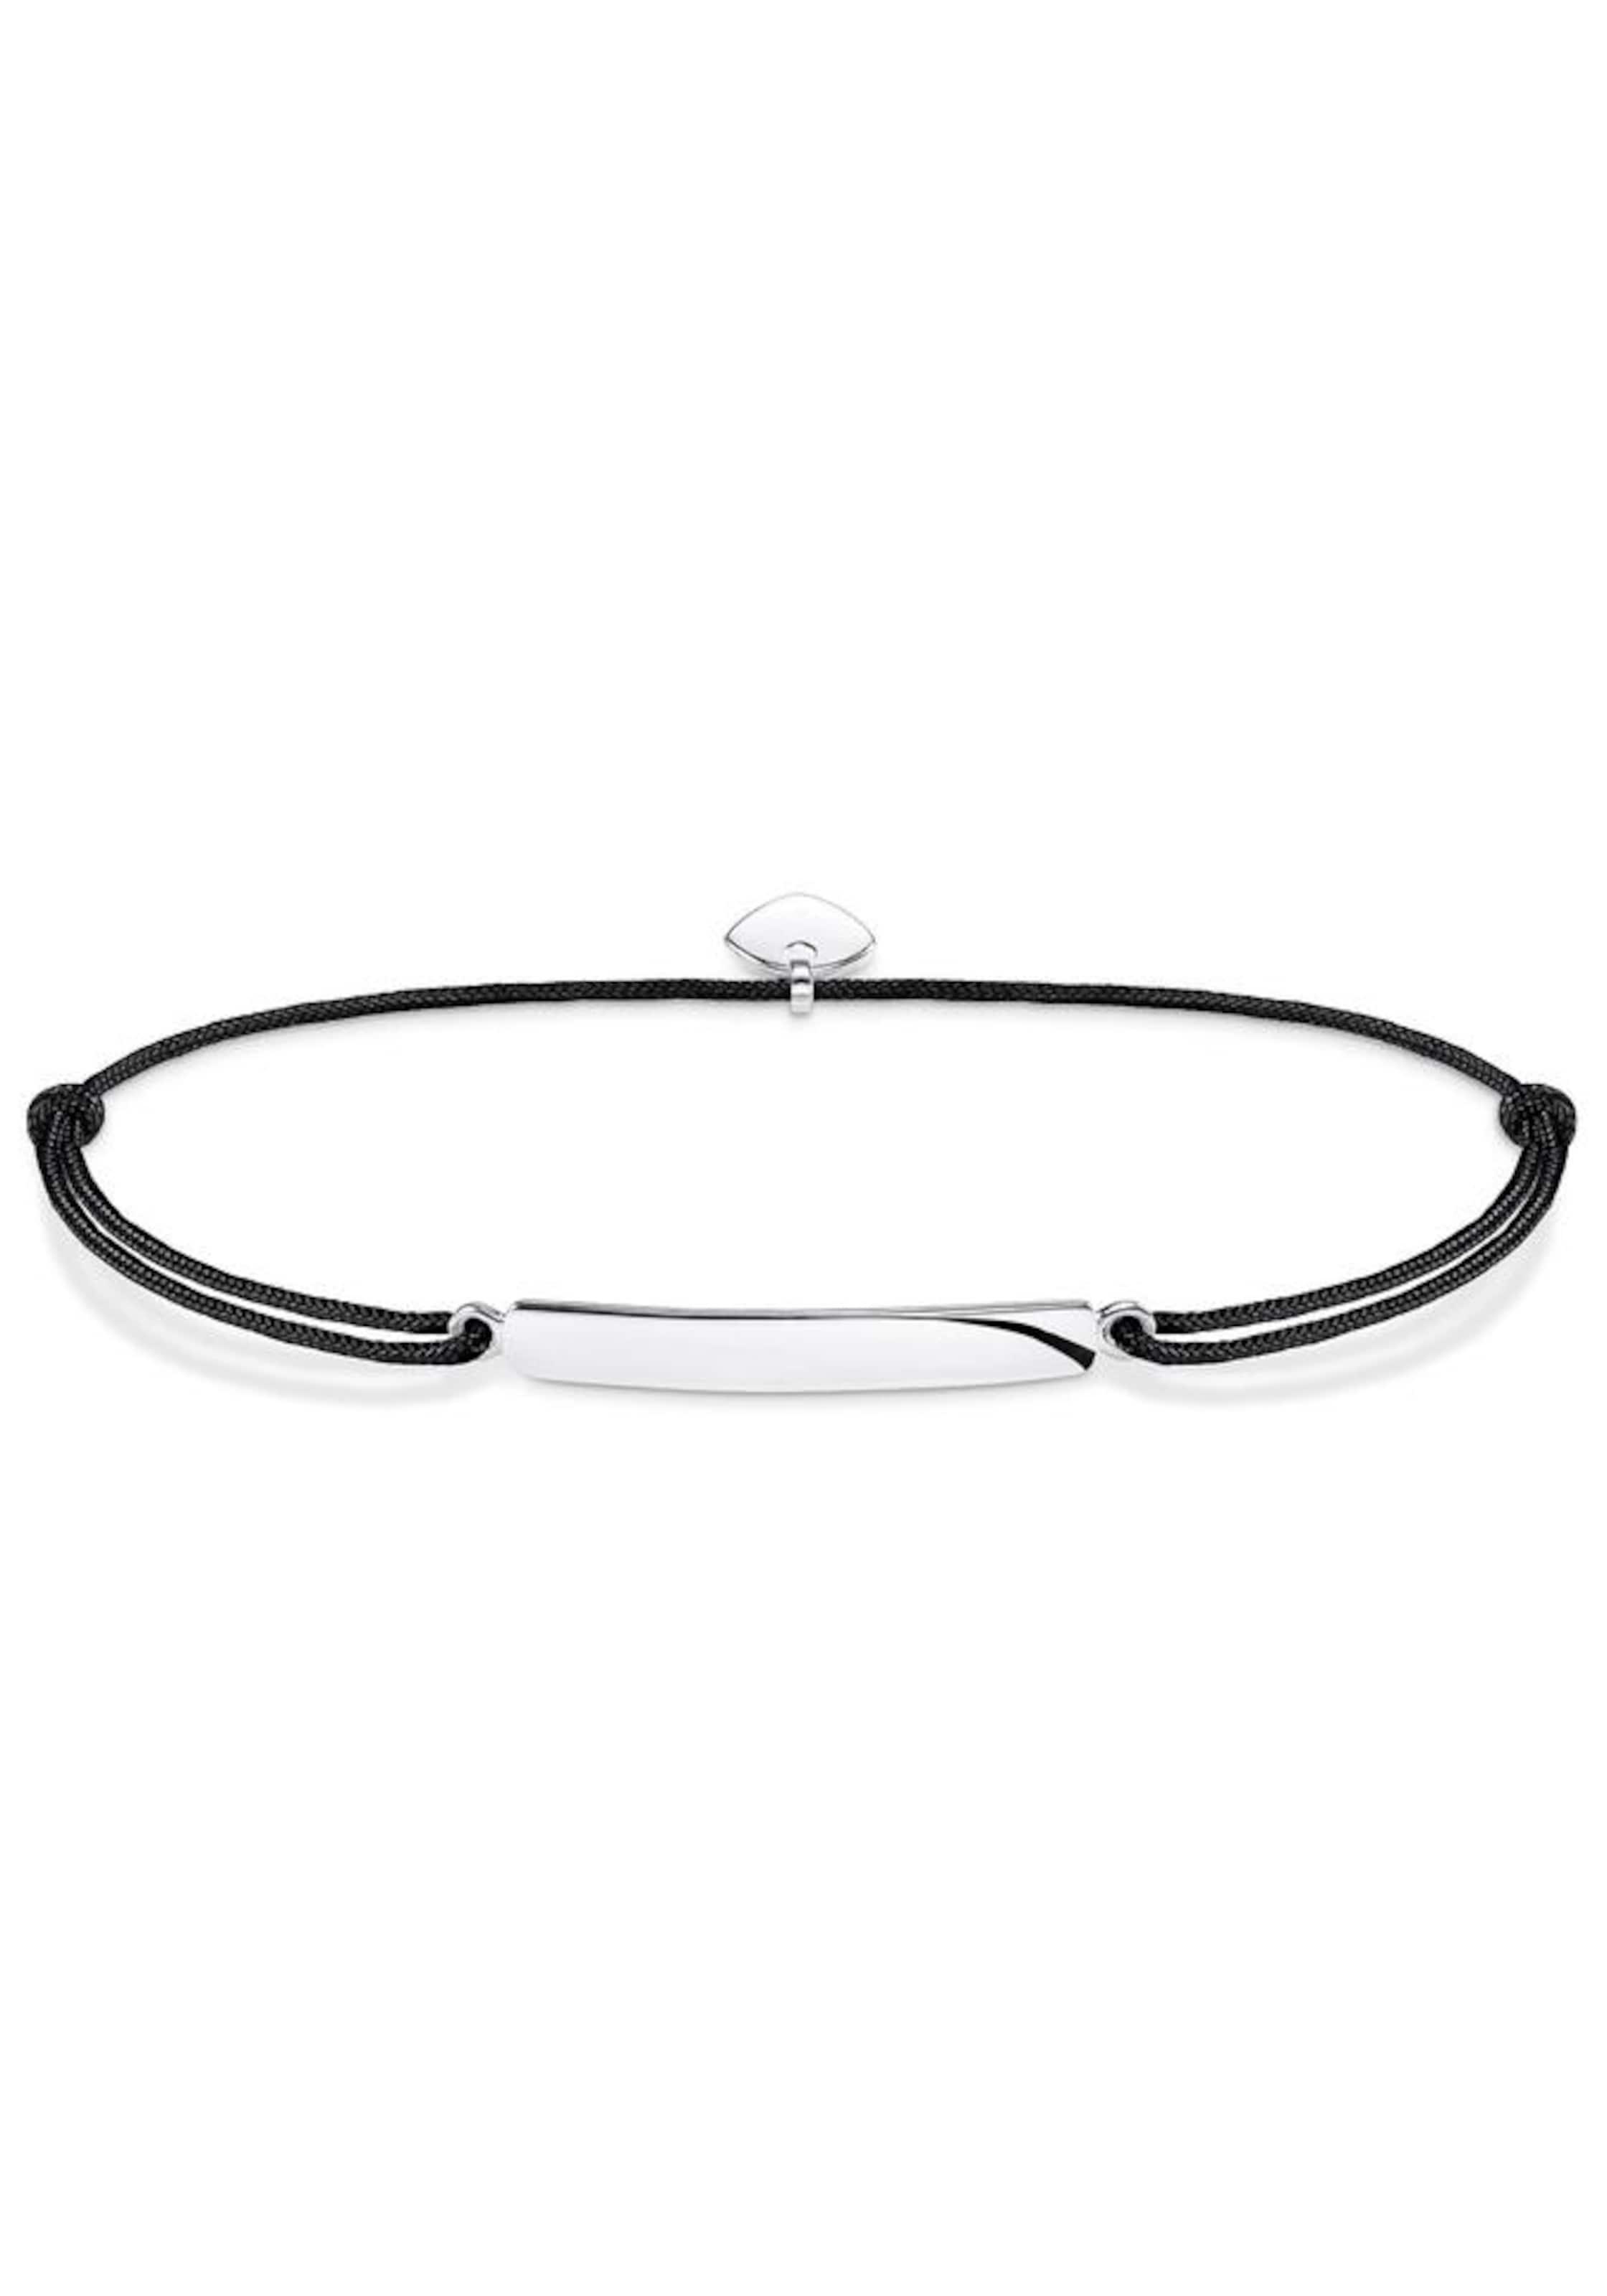 Thomas Sabo Armband 'Little Secret' Freiraum Für Verkauf vB2OP9Lk